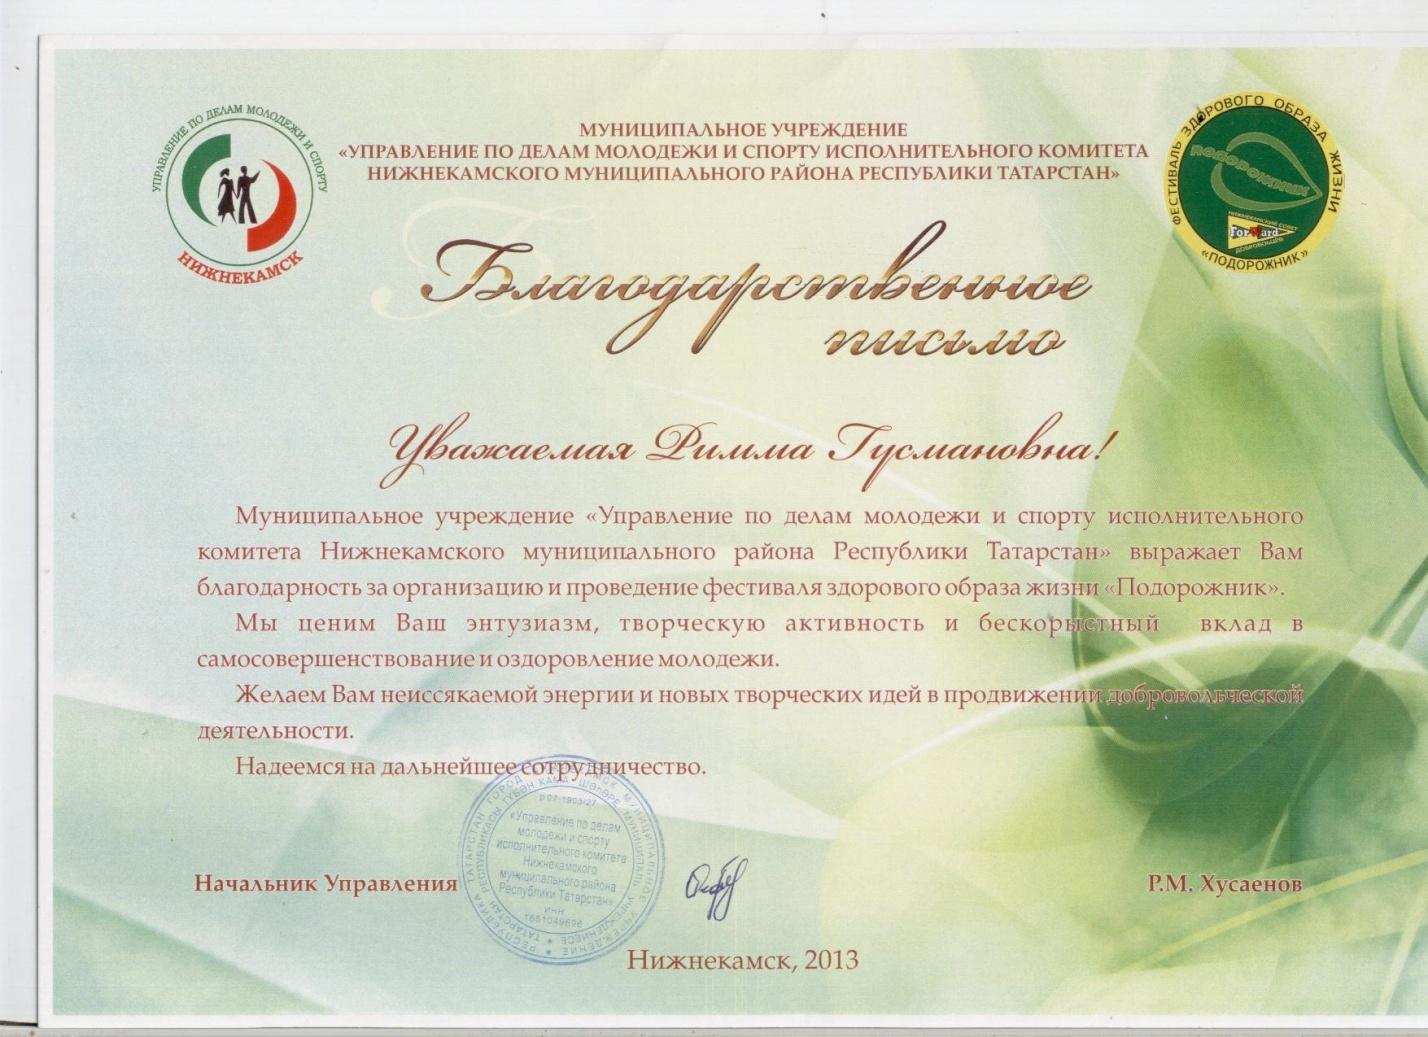 F:\Всероссйский конкурс Портфолио выпускника\РИММА\Римма 015.jpg